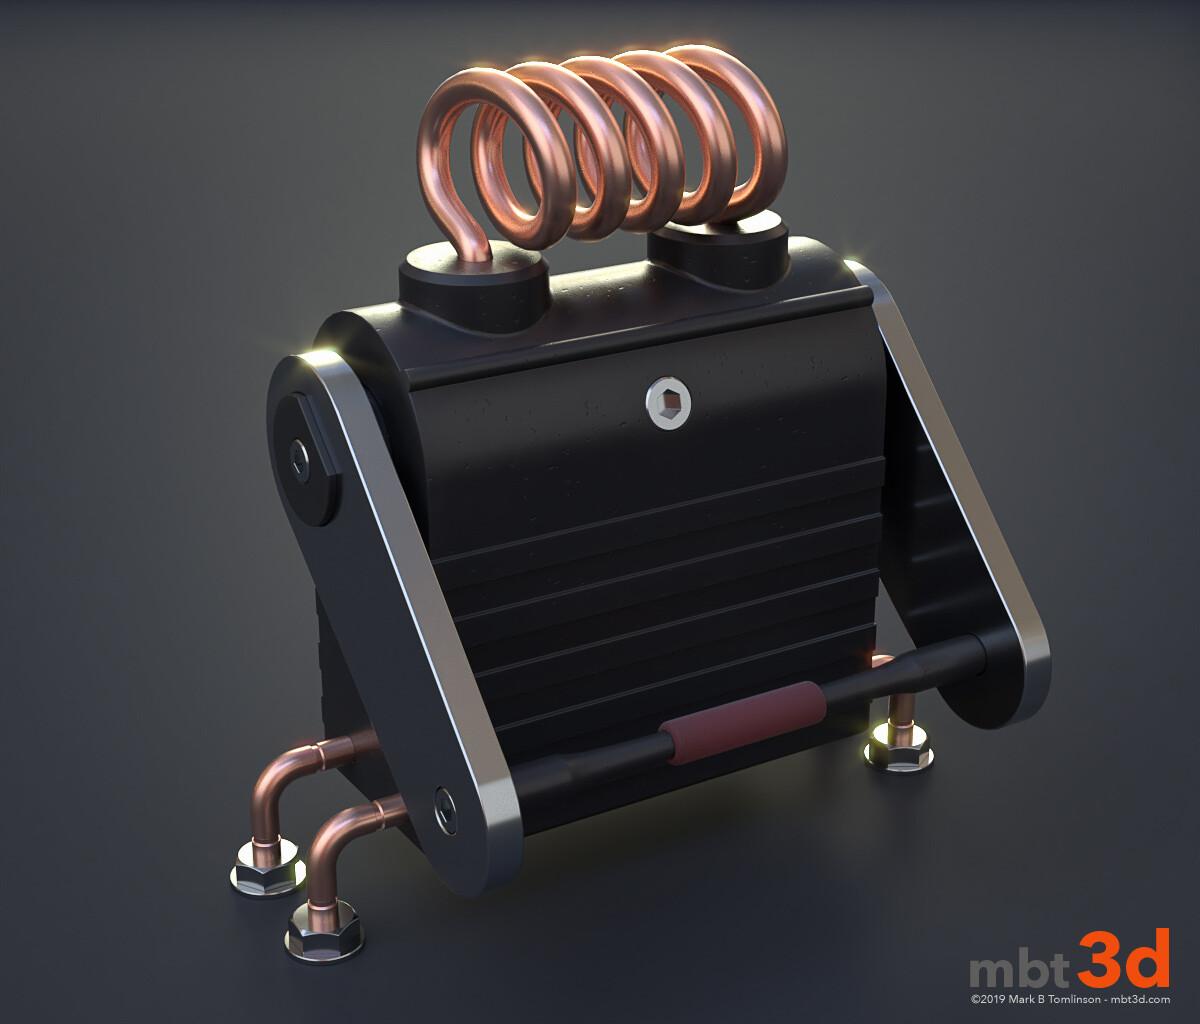 Mark b tomlinson coily 01